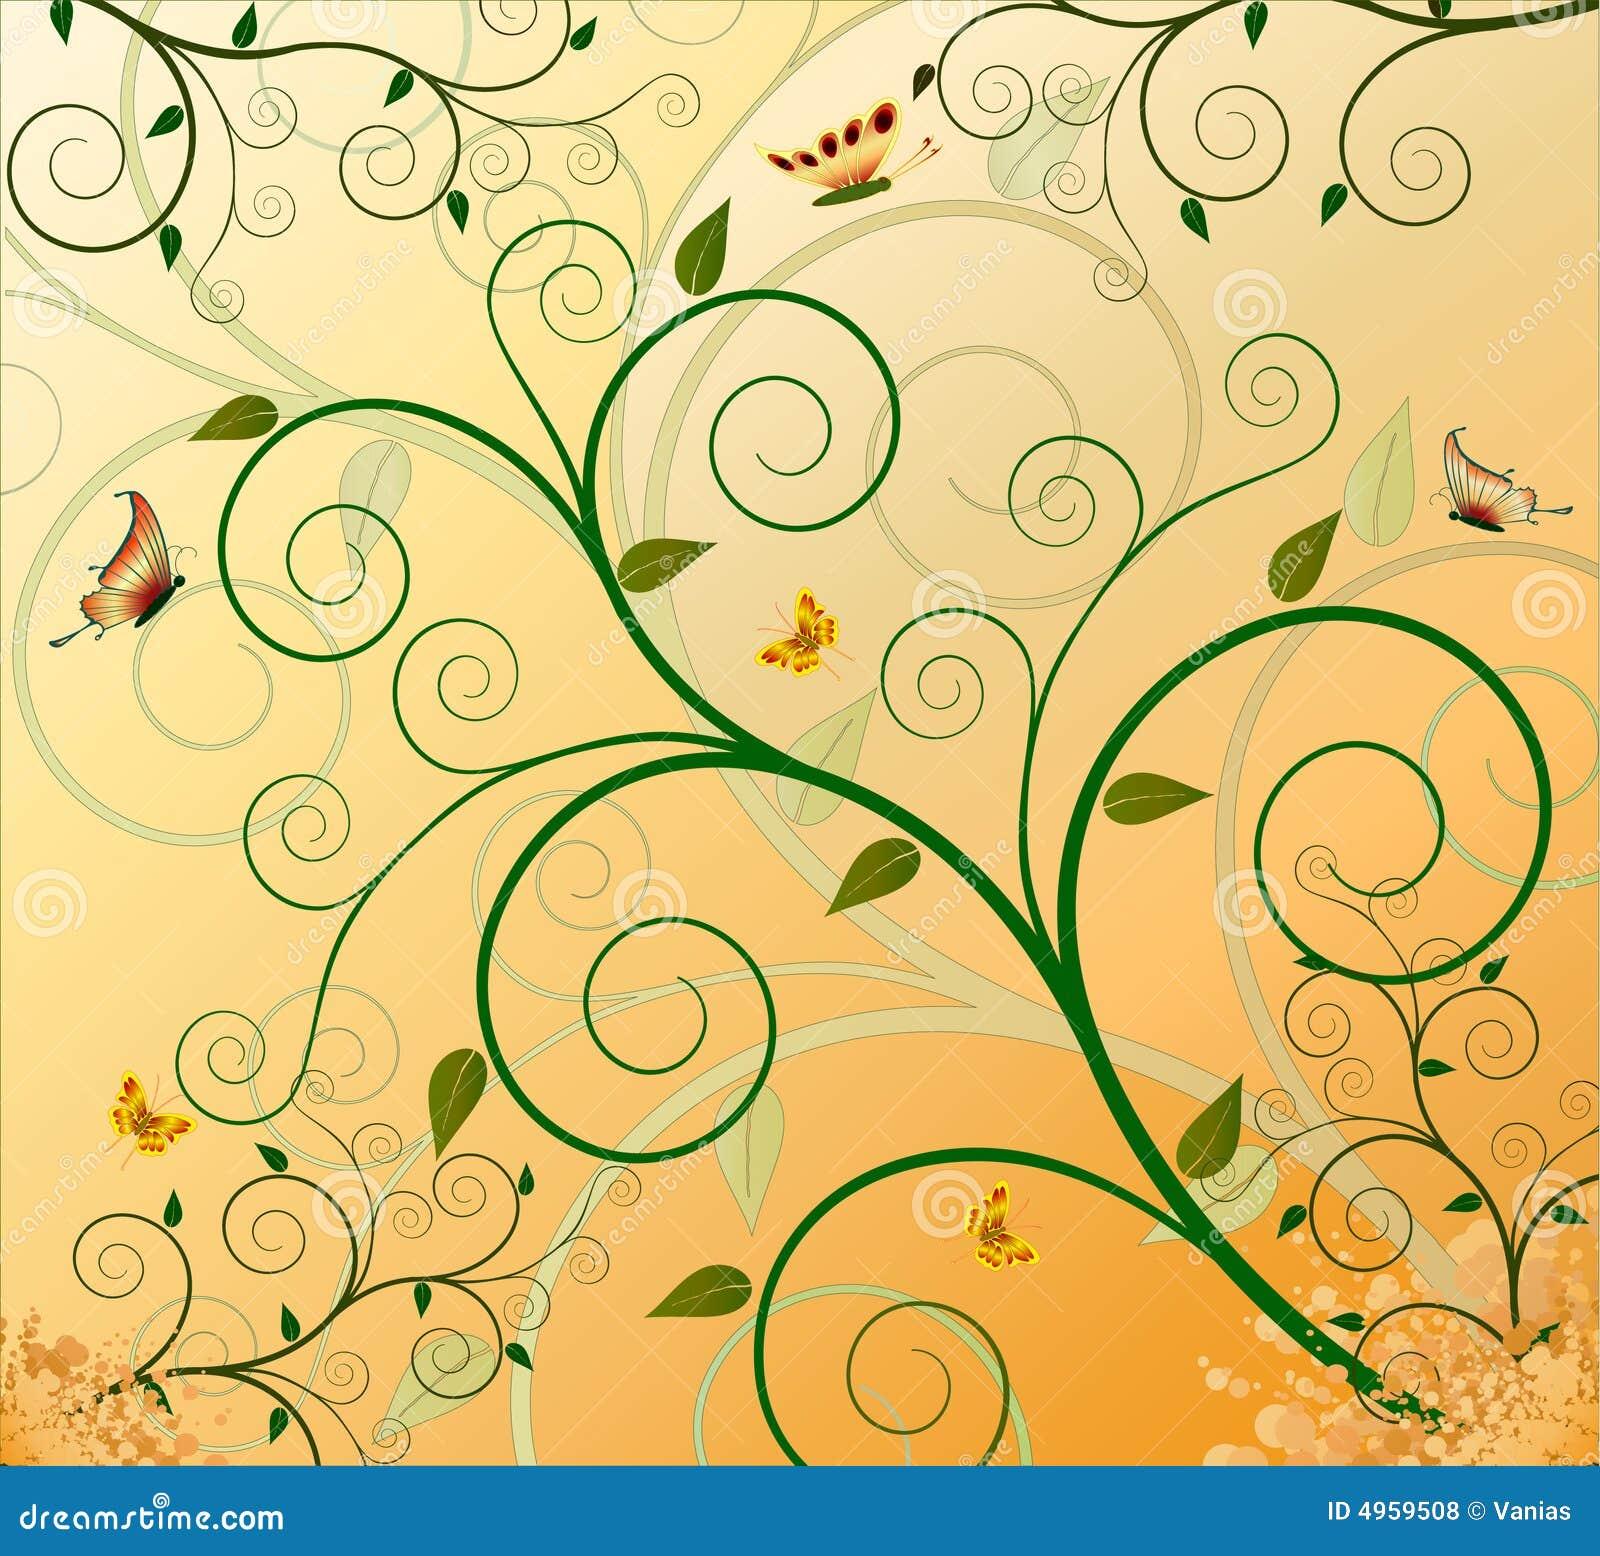 Floral Art Designs